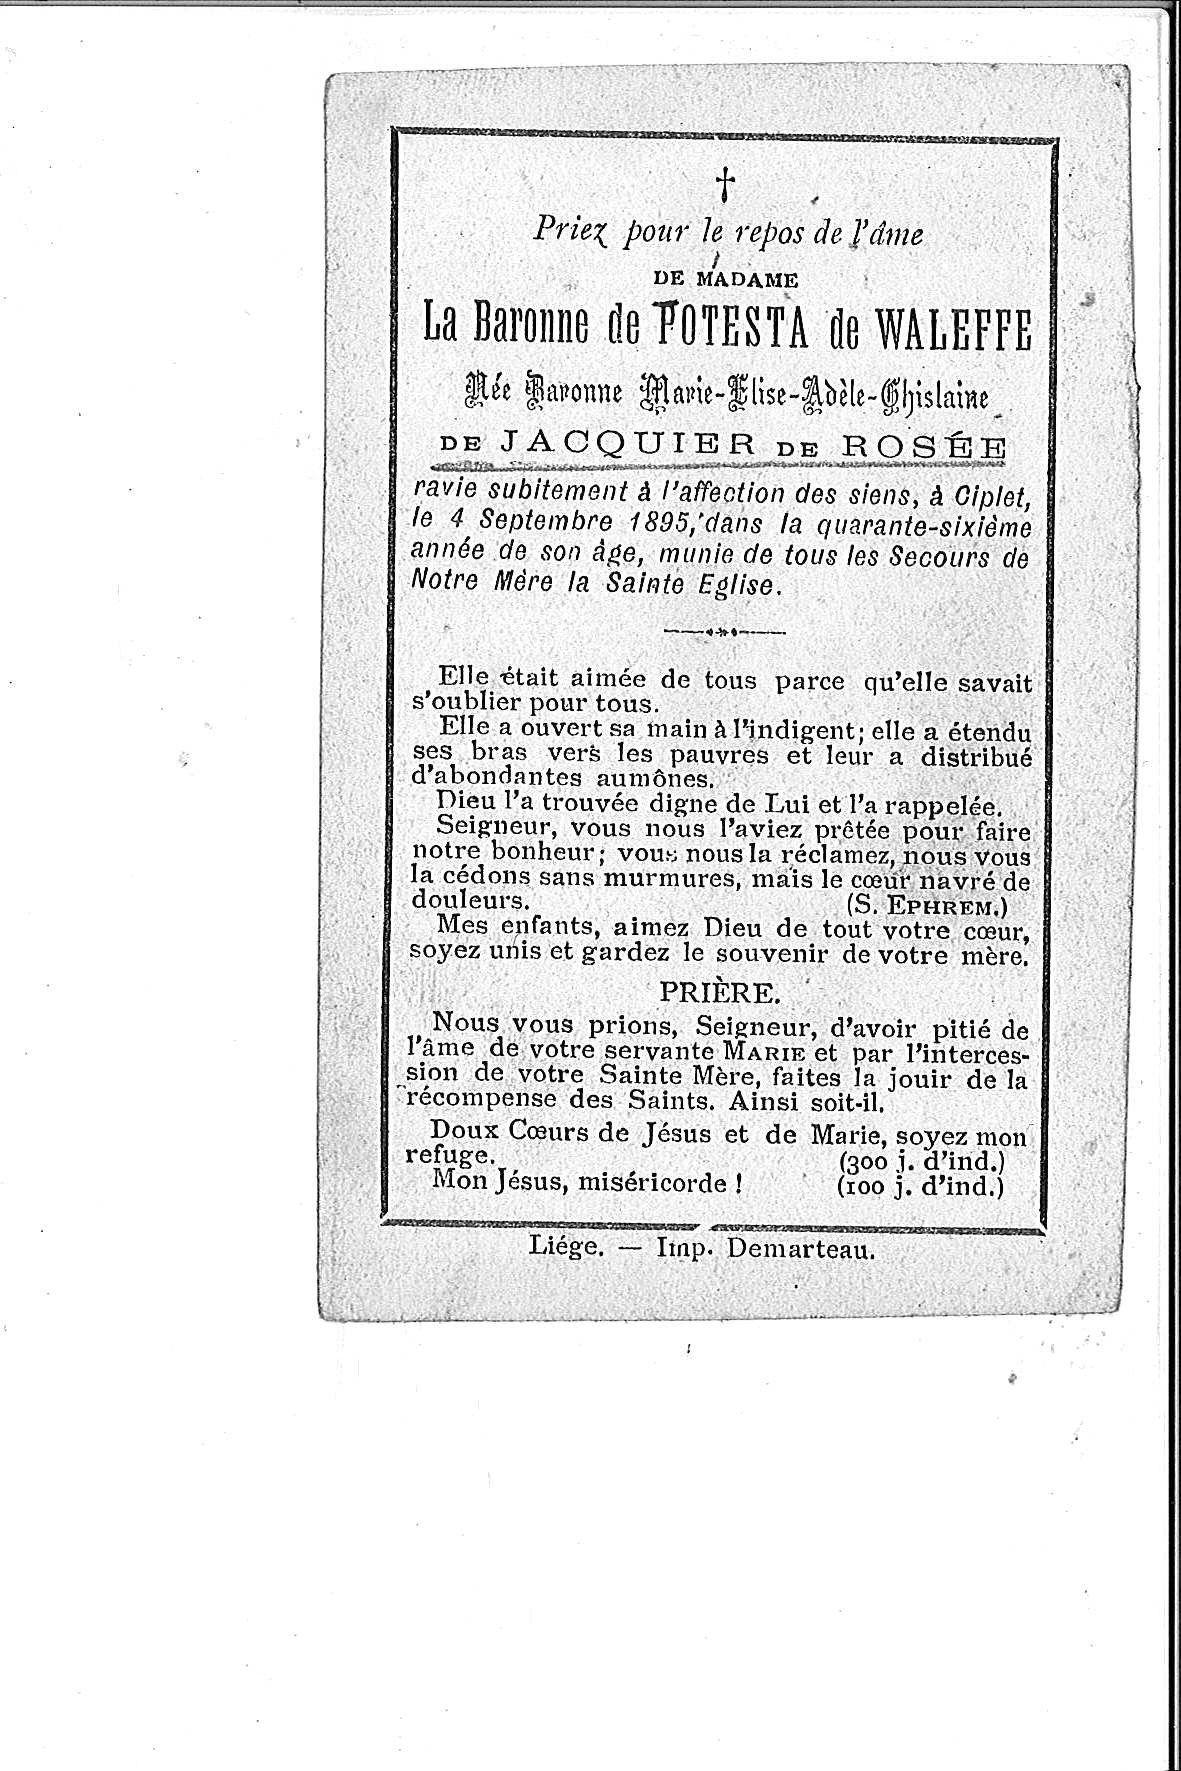 Marie-Elise-Adèle-Ghislaine(1895)20150422085139_00013.jpg